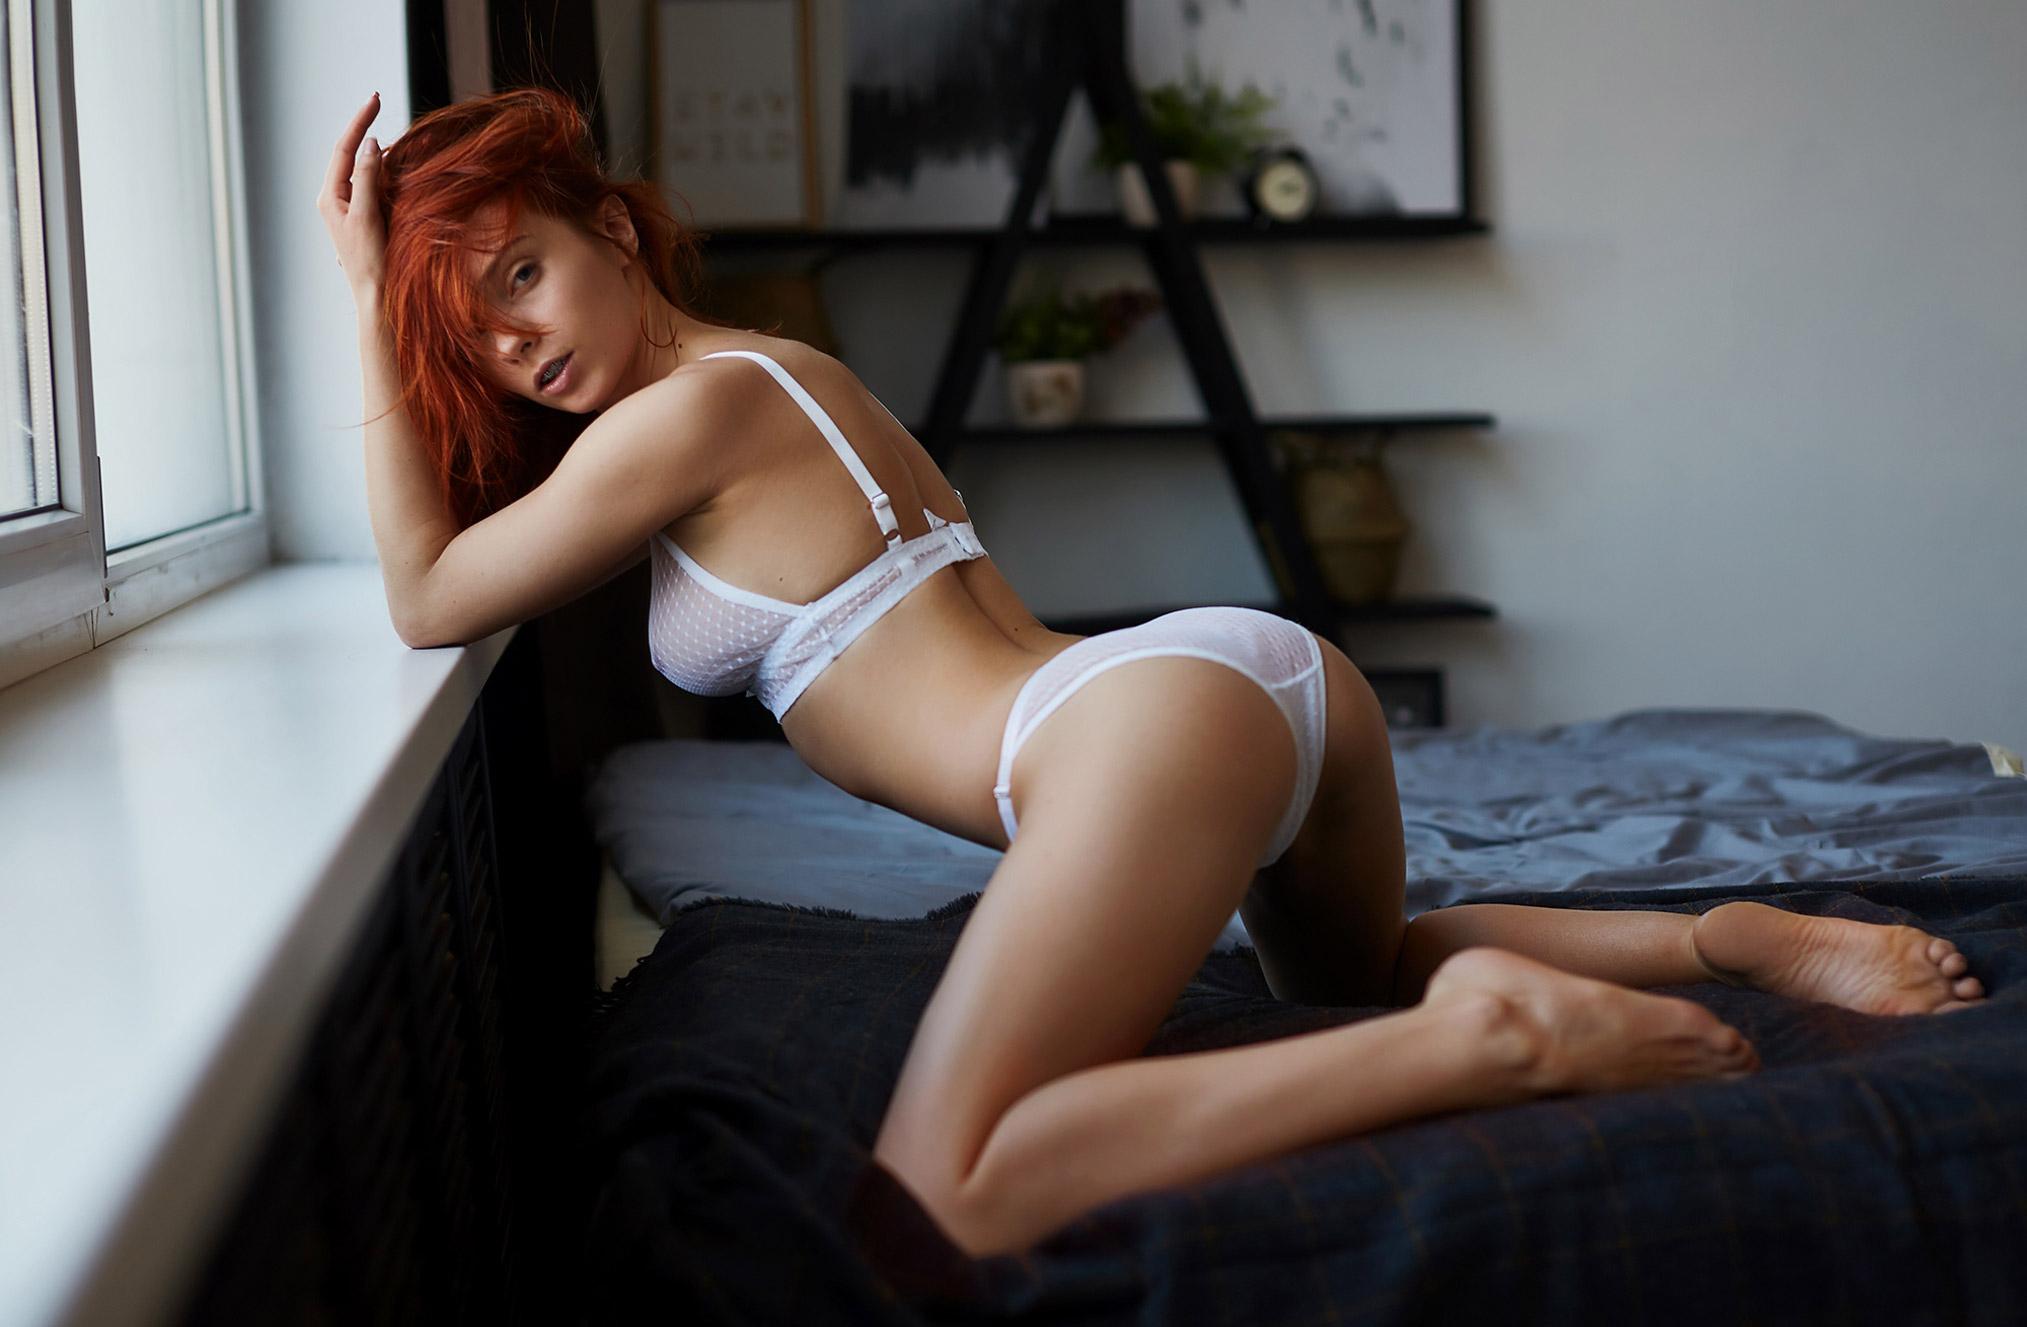 Марта Громова, фотограф Дмитрий Лобанов / фото 01